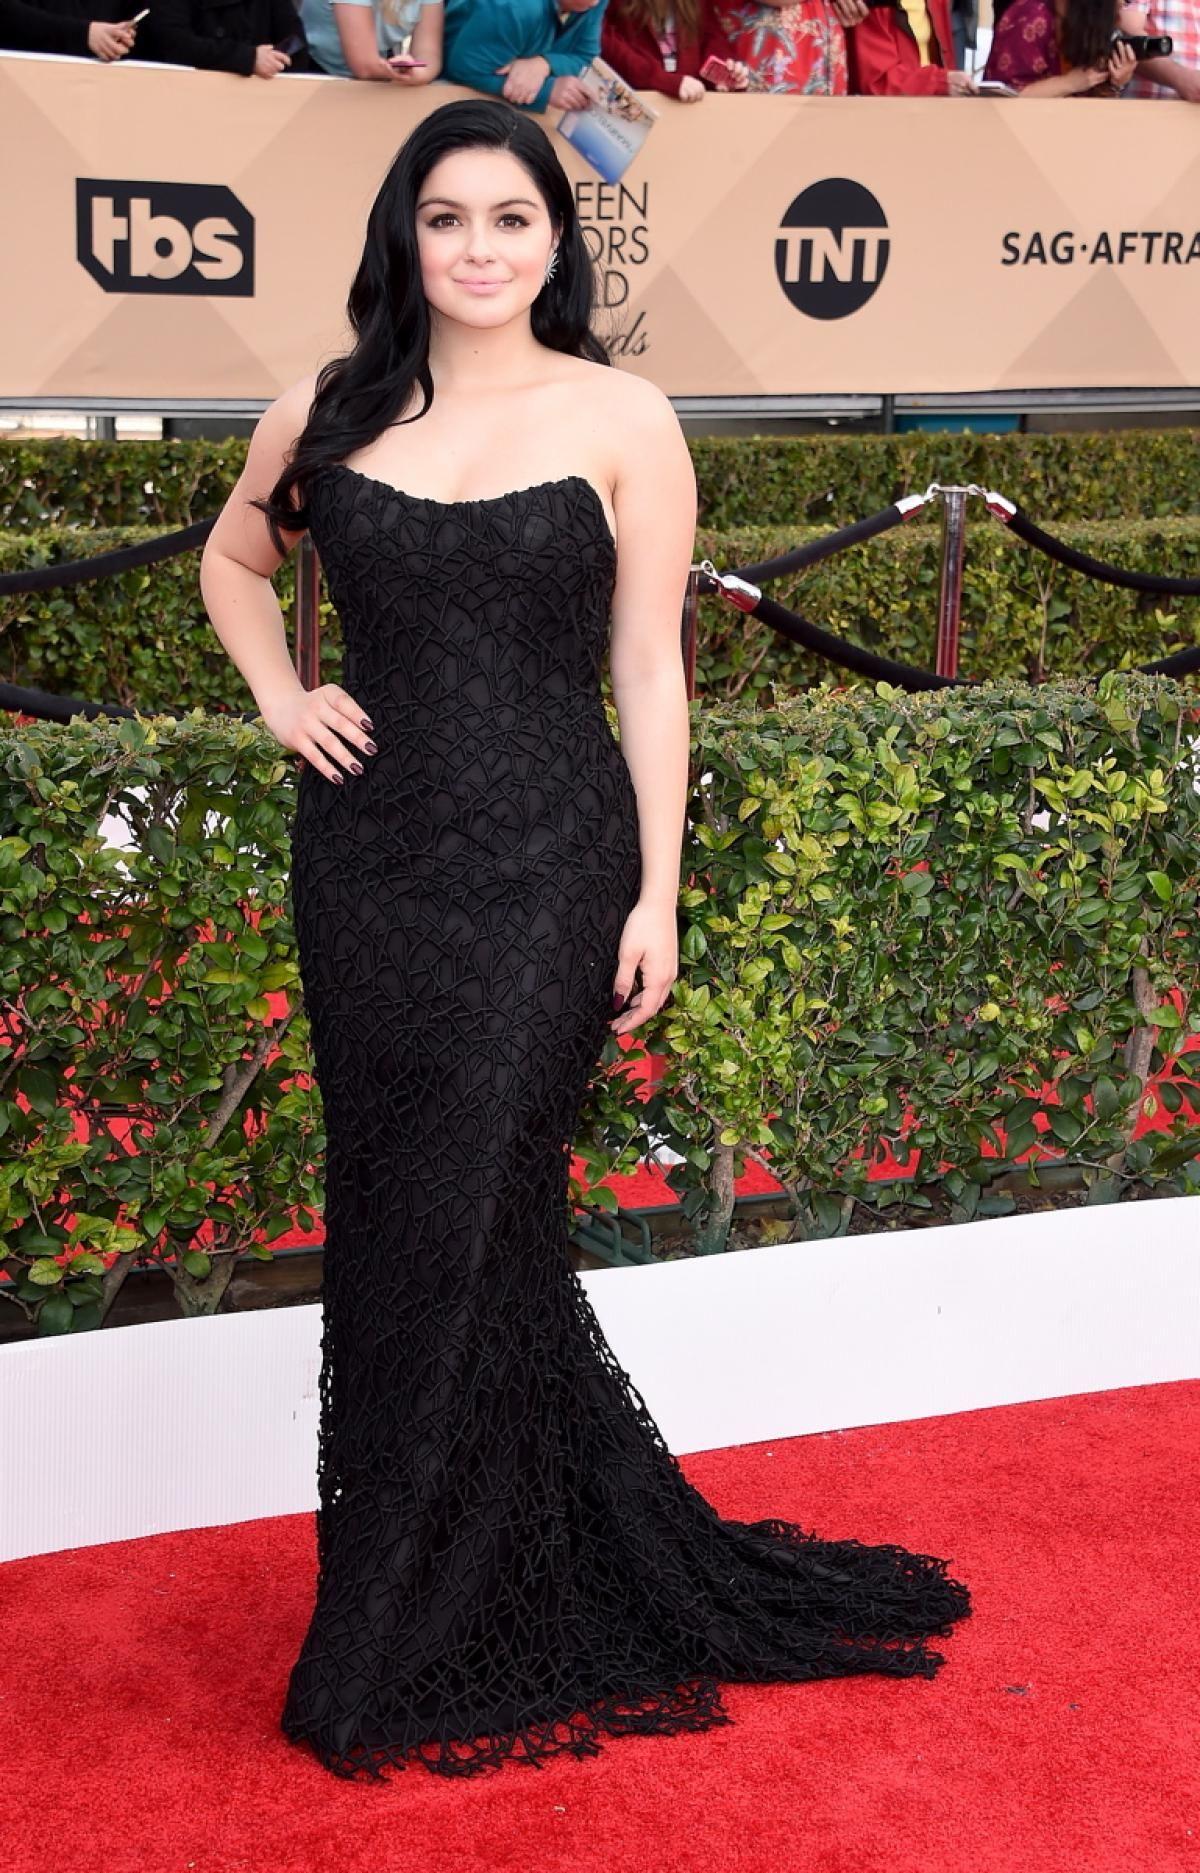 The dress ariel wore -  Modern Family Actress Actress Ariel Winter Wore A Beautiful Black Romona Keveza Dress To